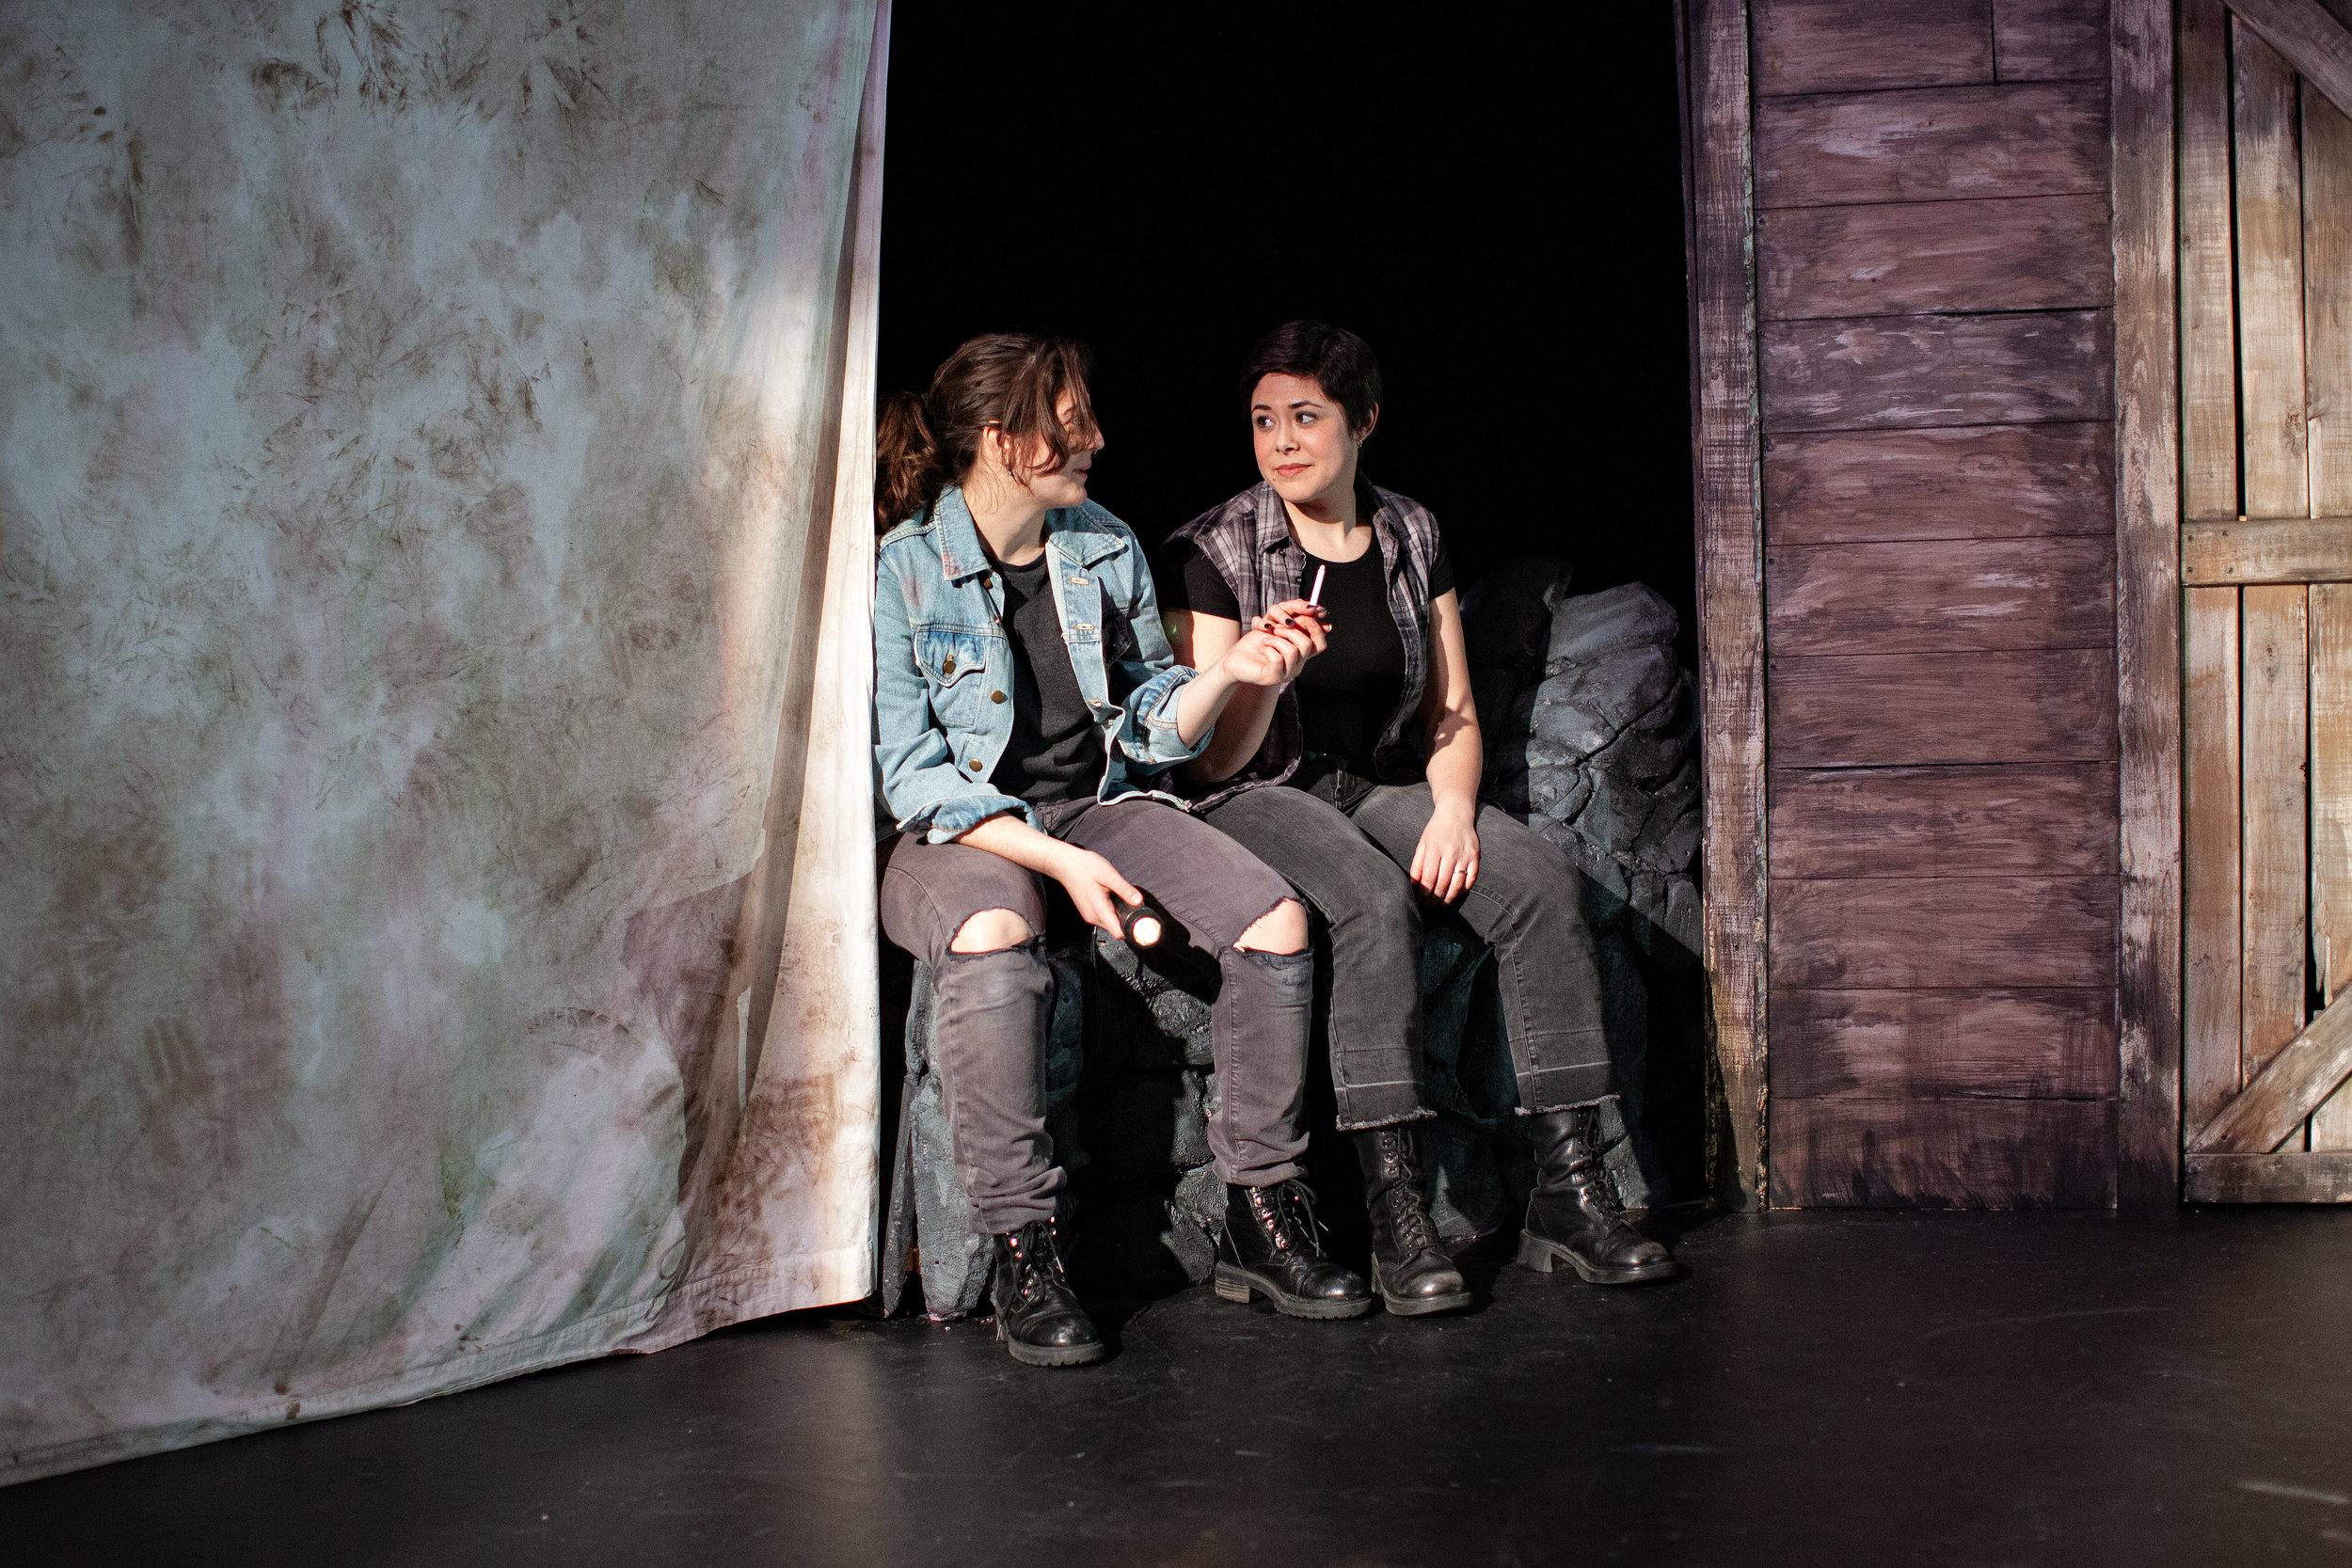 Macbeth and Banquo.jpg